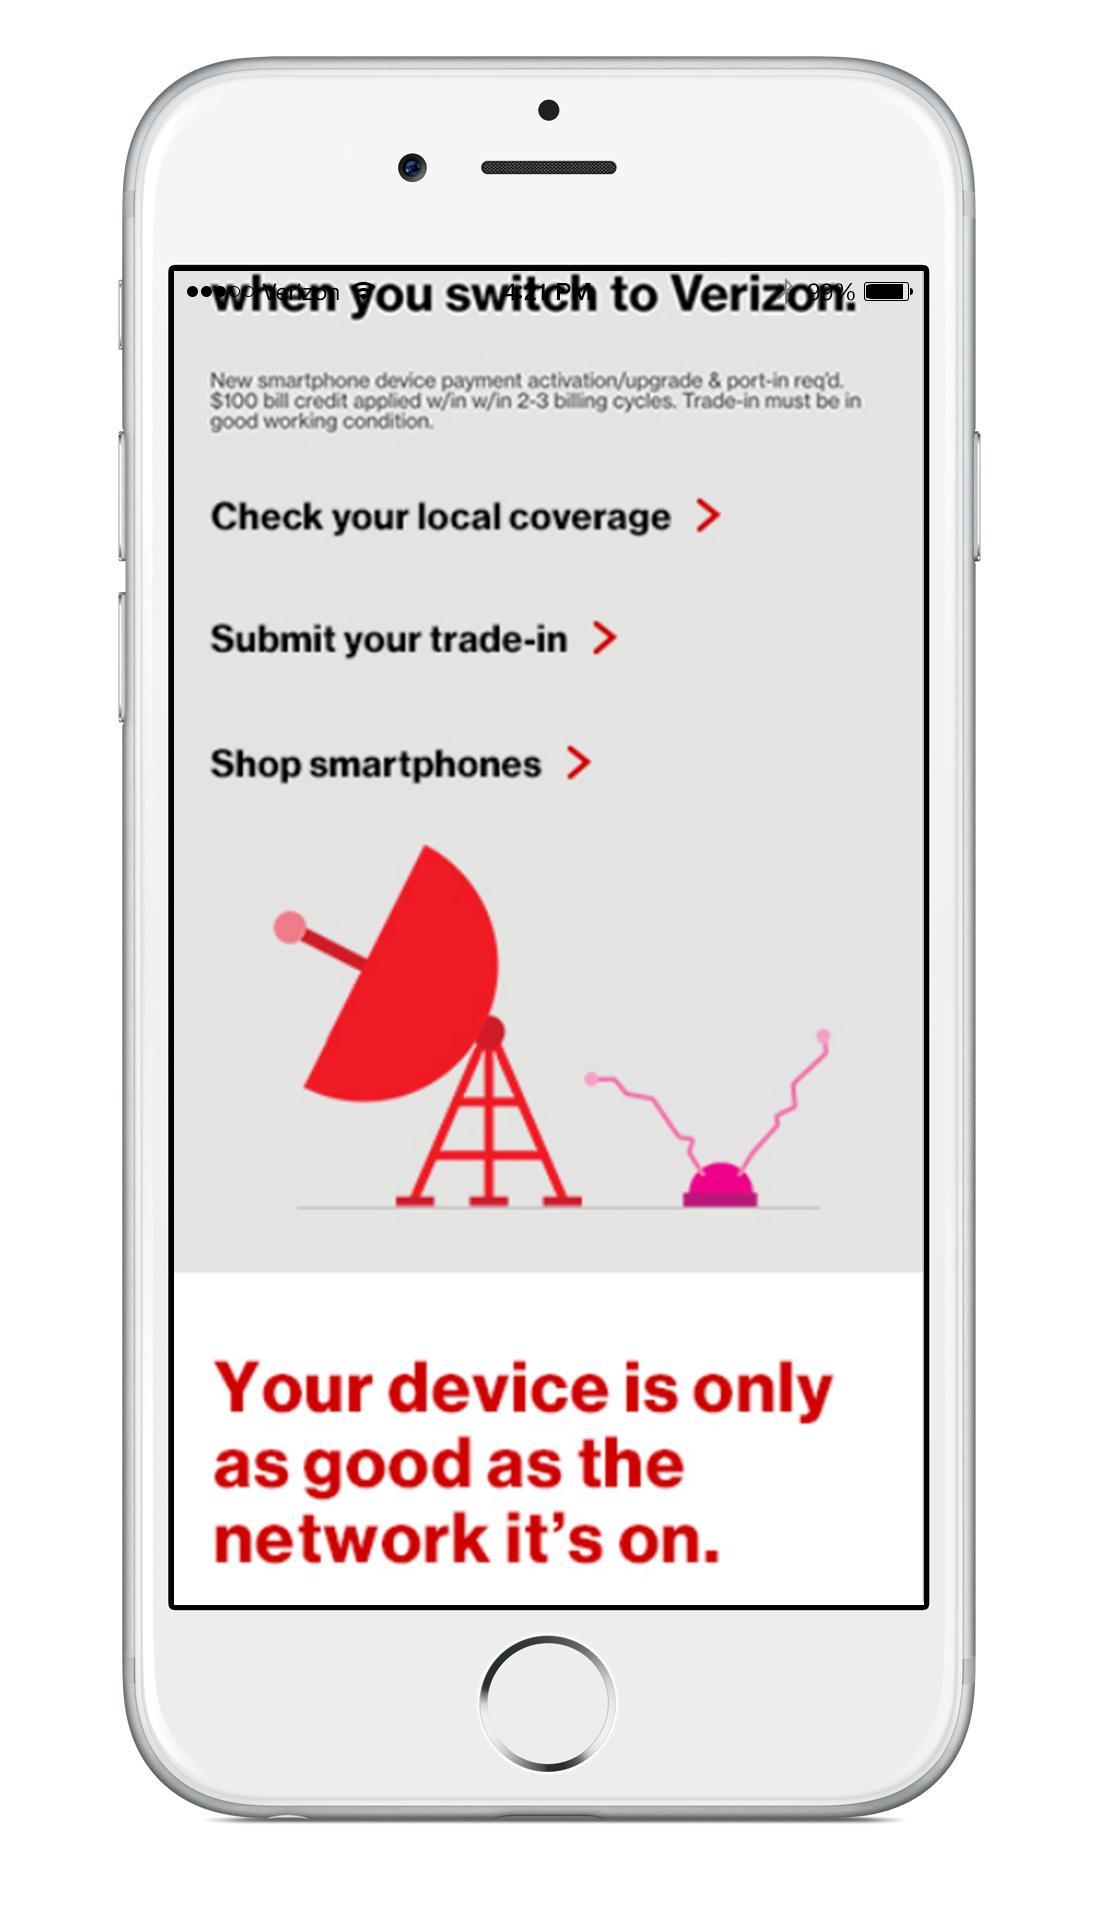 Verizon_Comps_indevice_tmo2.jpg